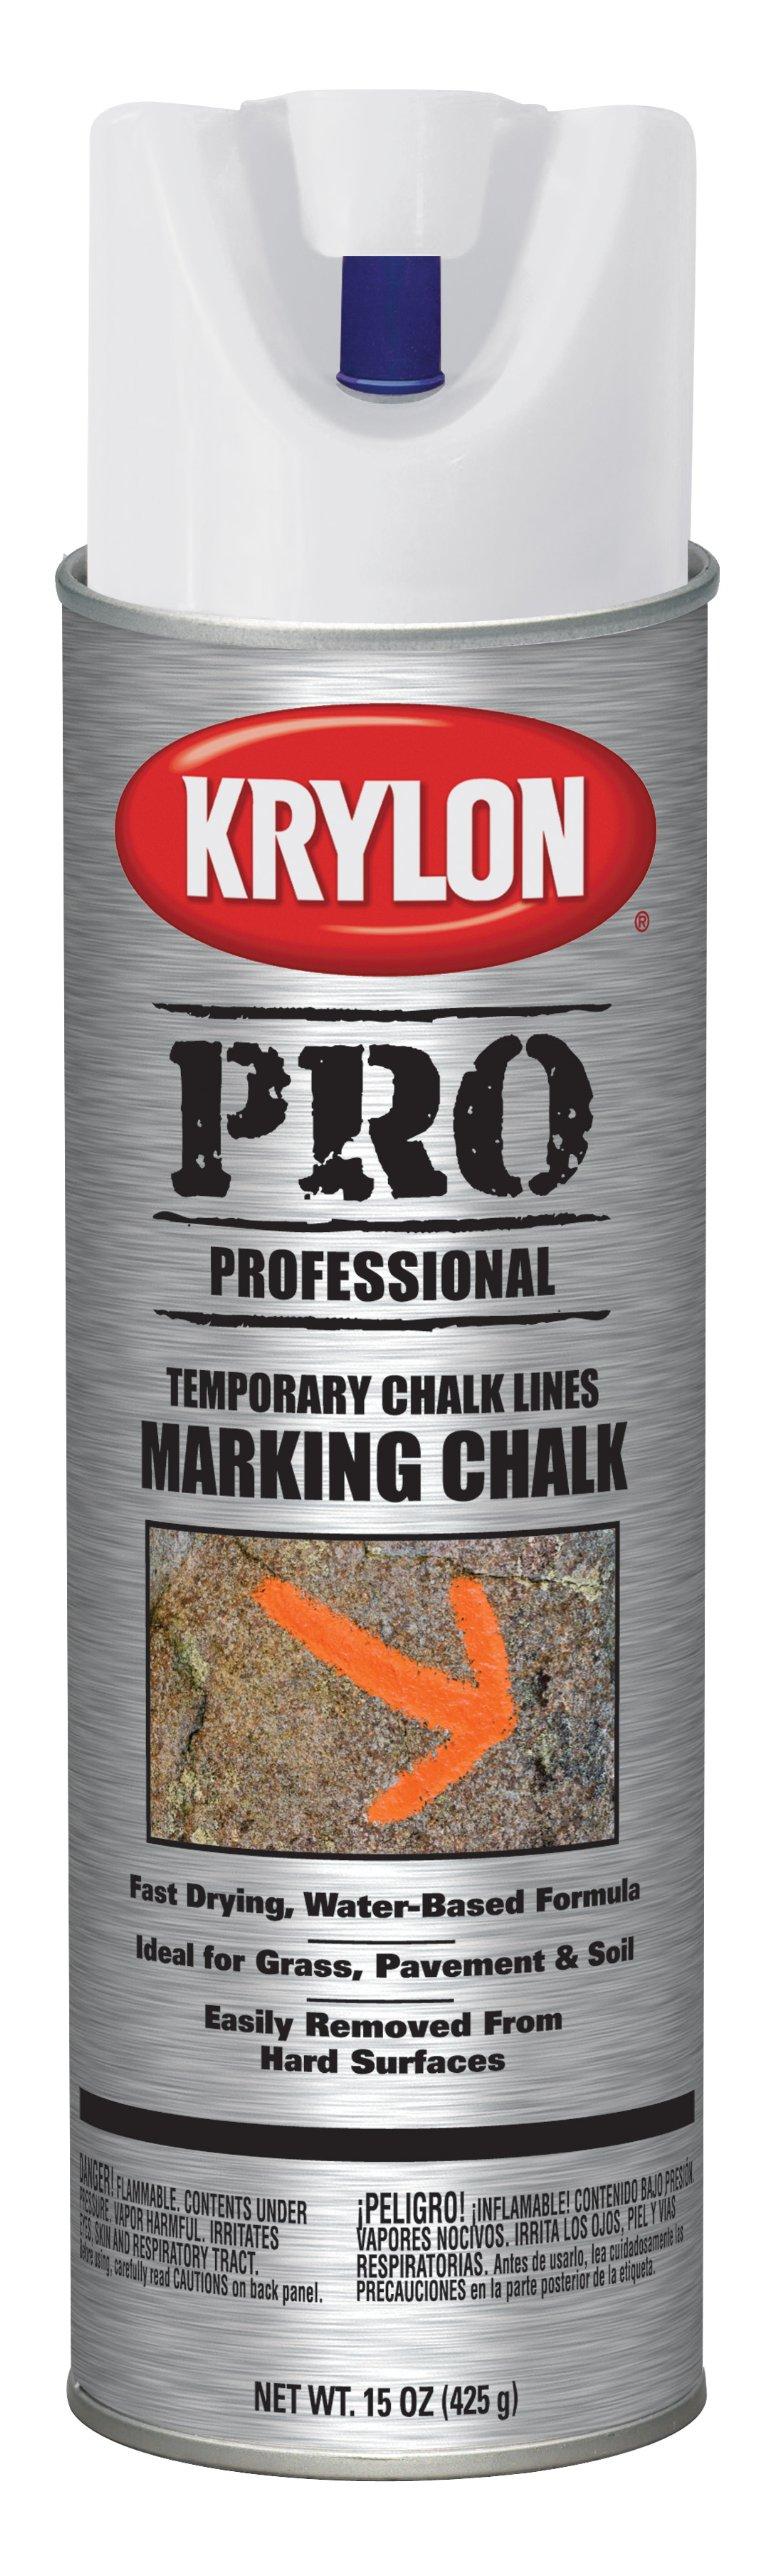 Krylon 5894 Marking Chalk White